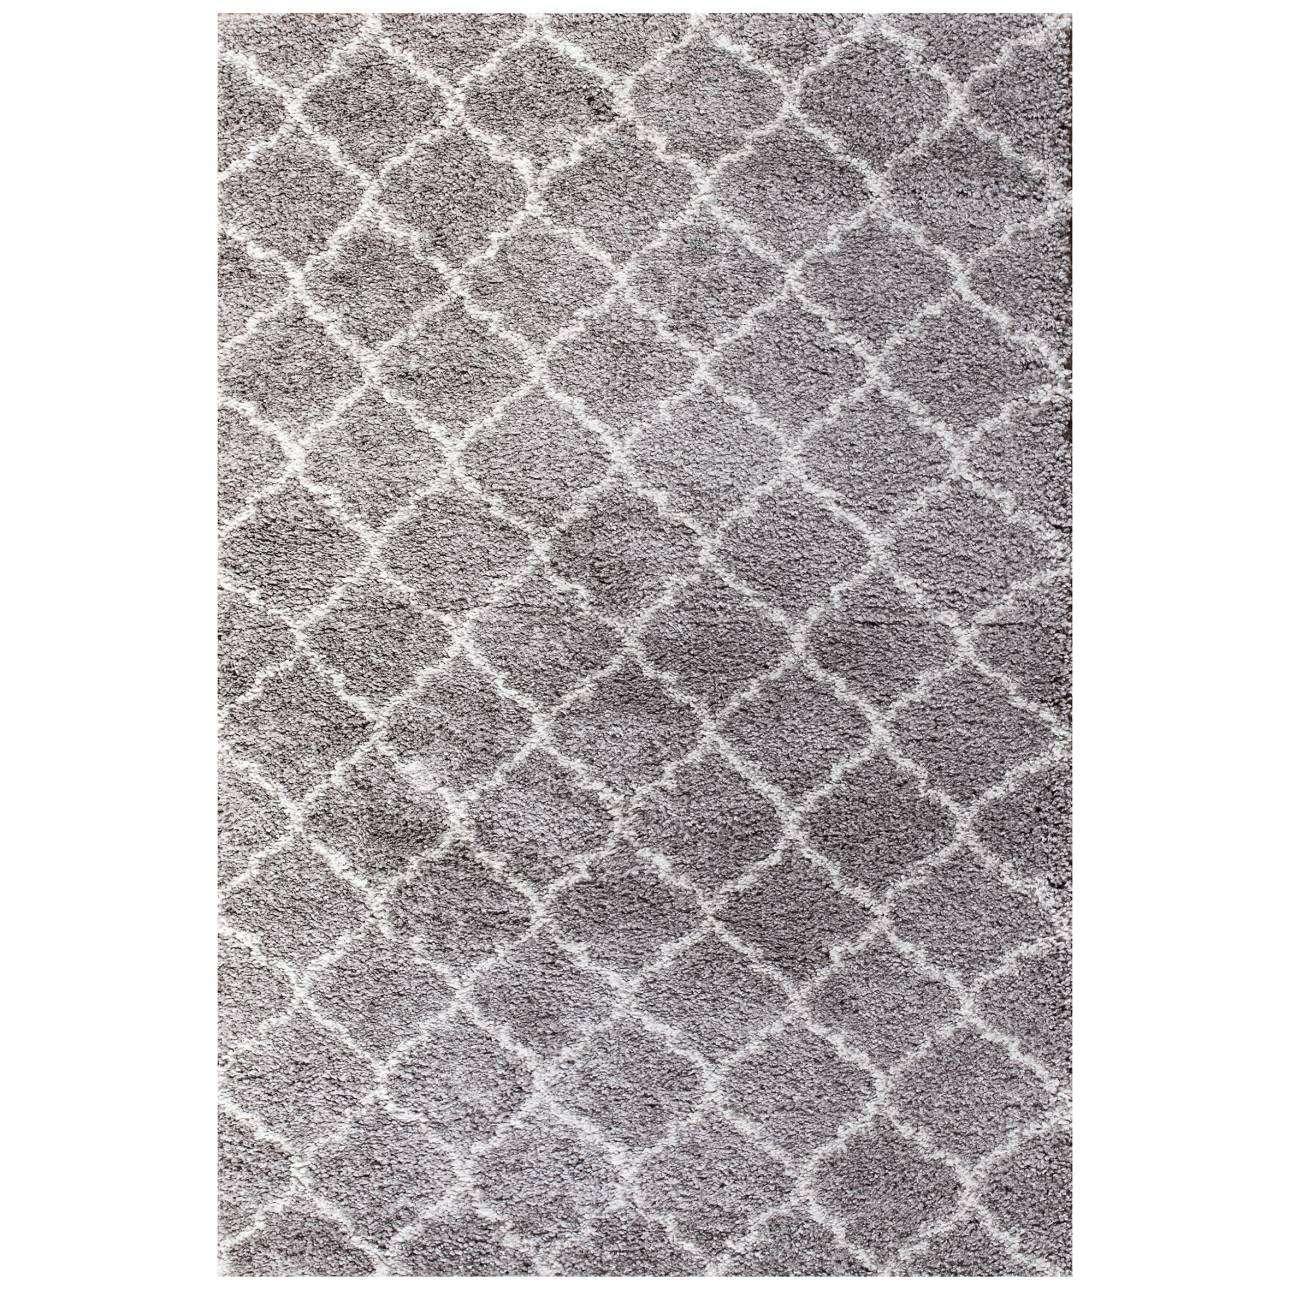 Royal Morocco Dove Grey/Cream Area Rug 120x170cm